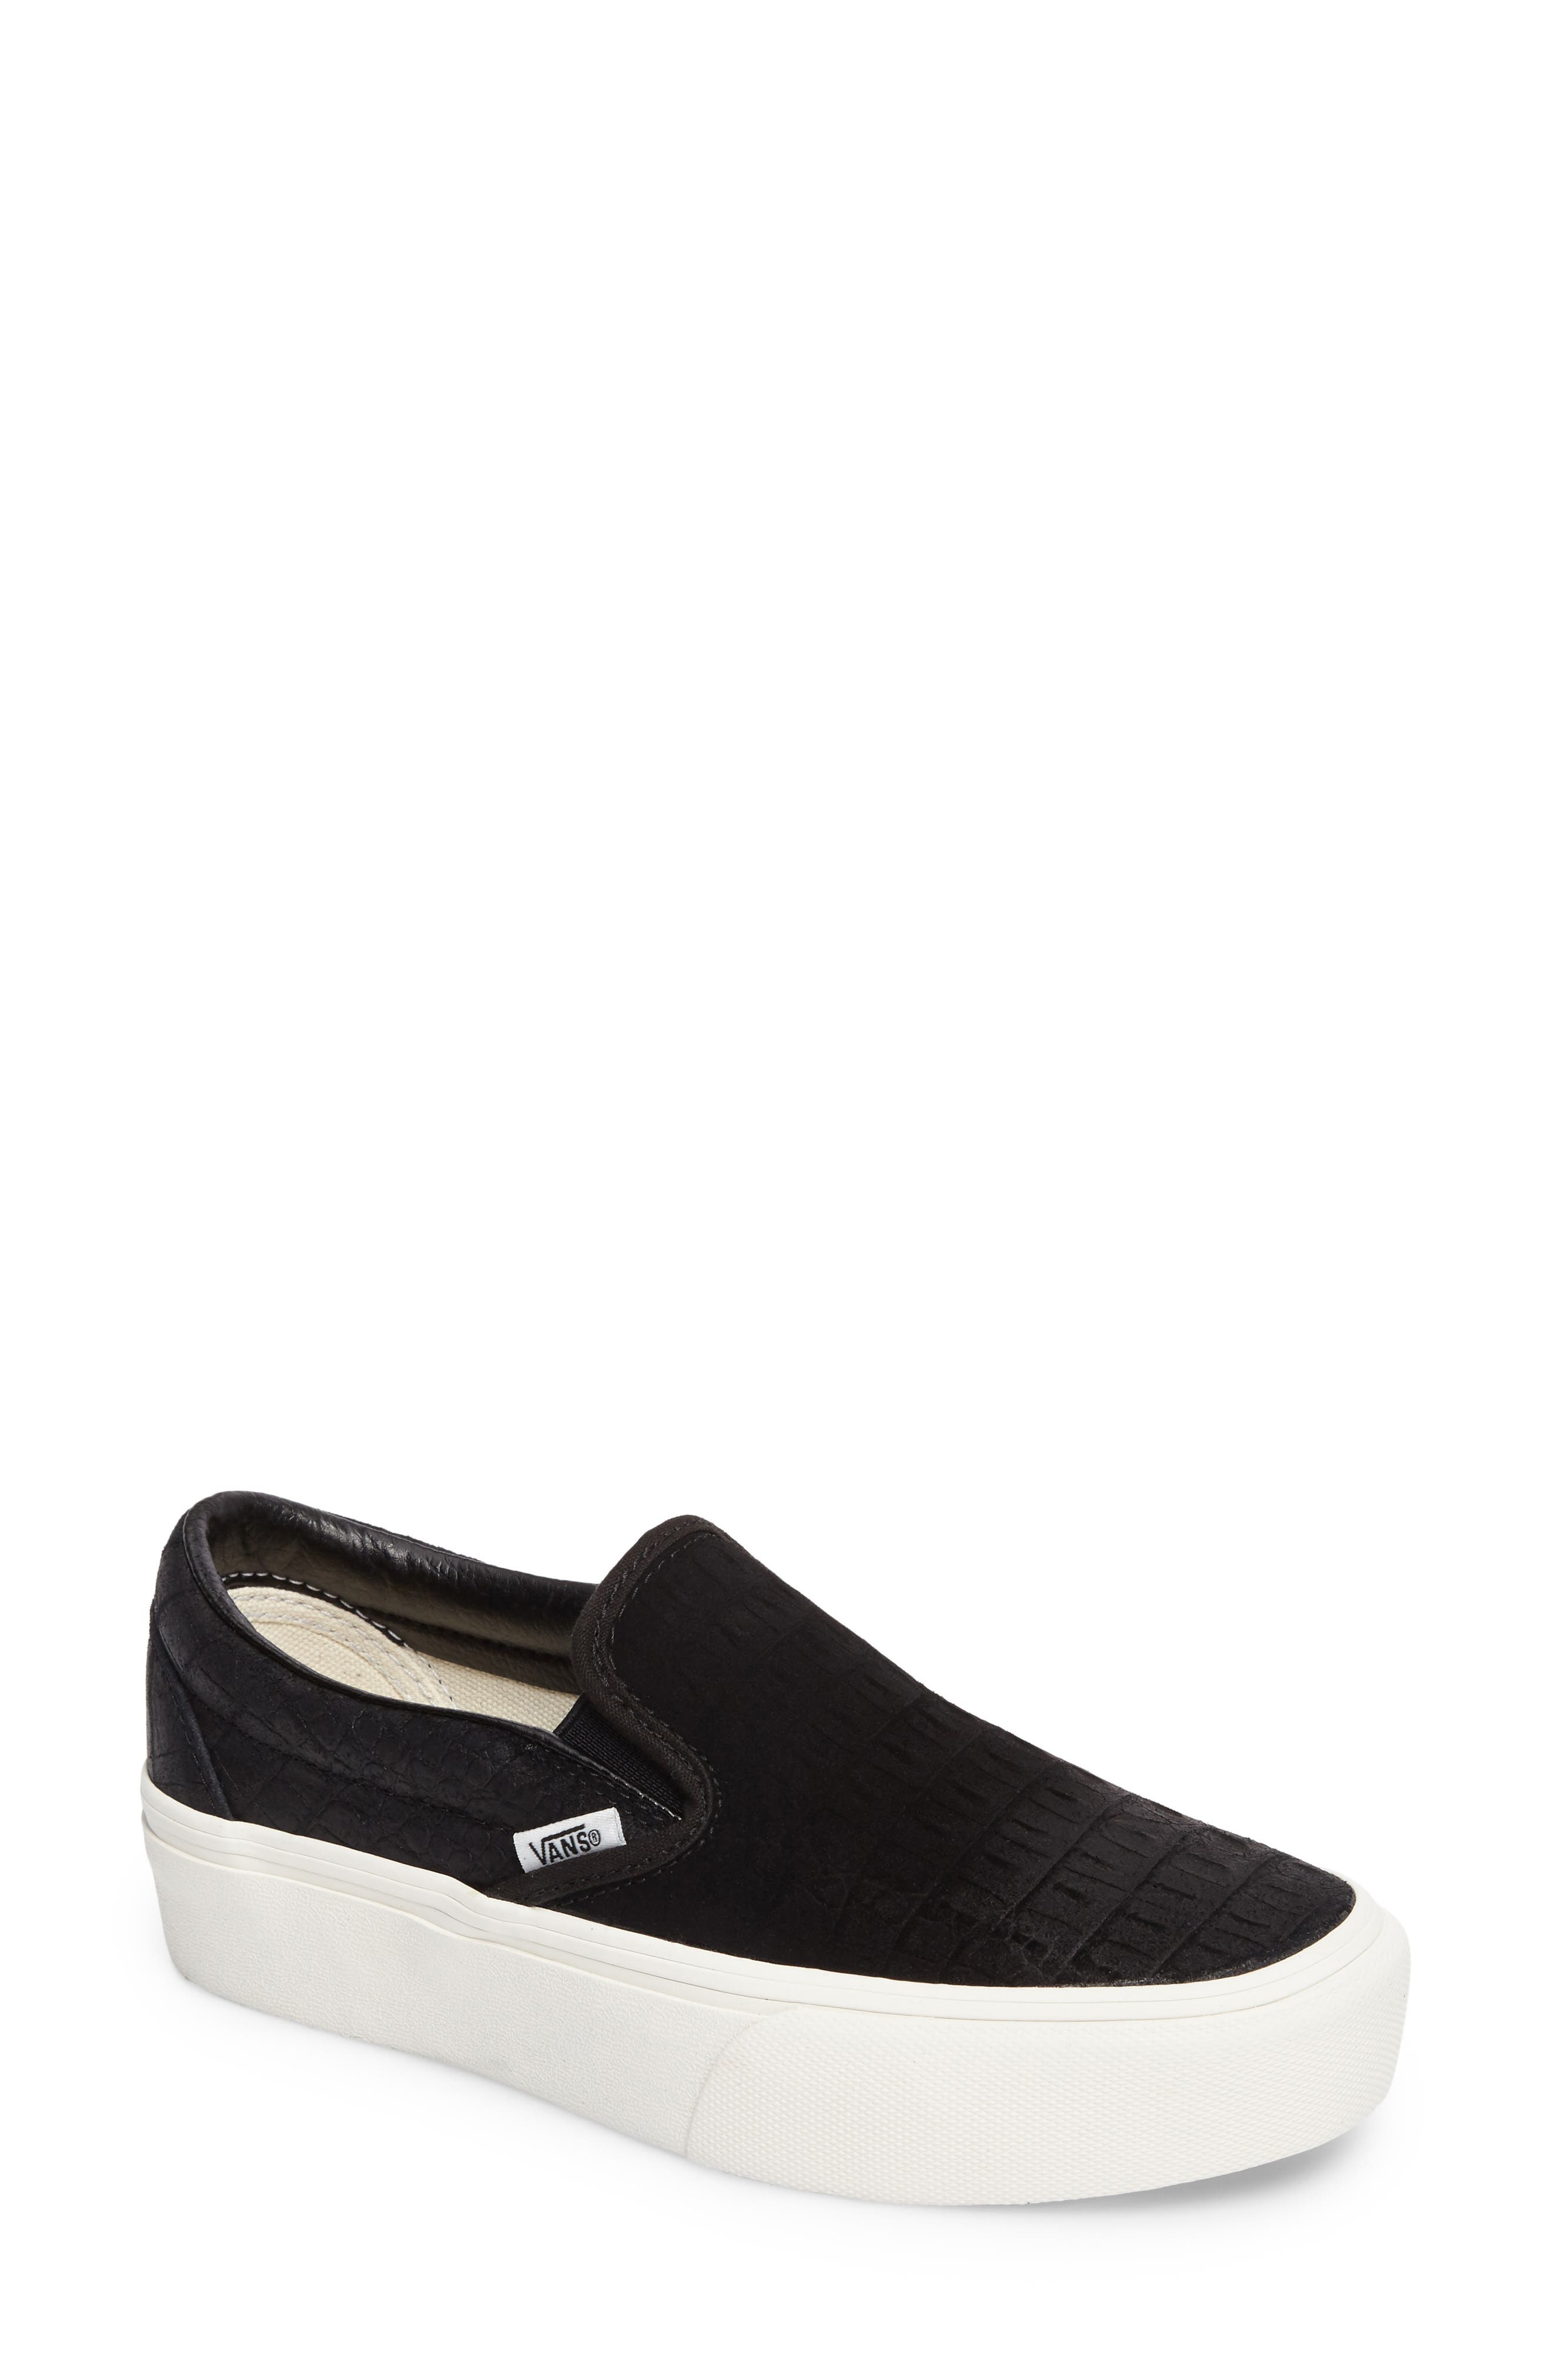 Vans Platform Slip-On Sneaker (Women)